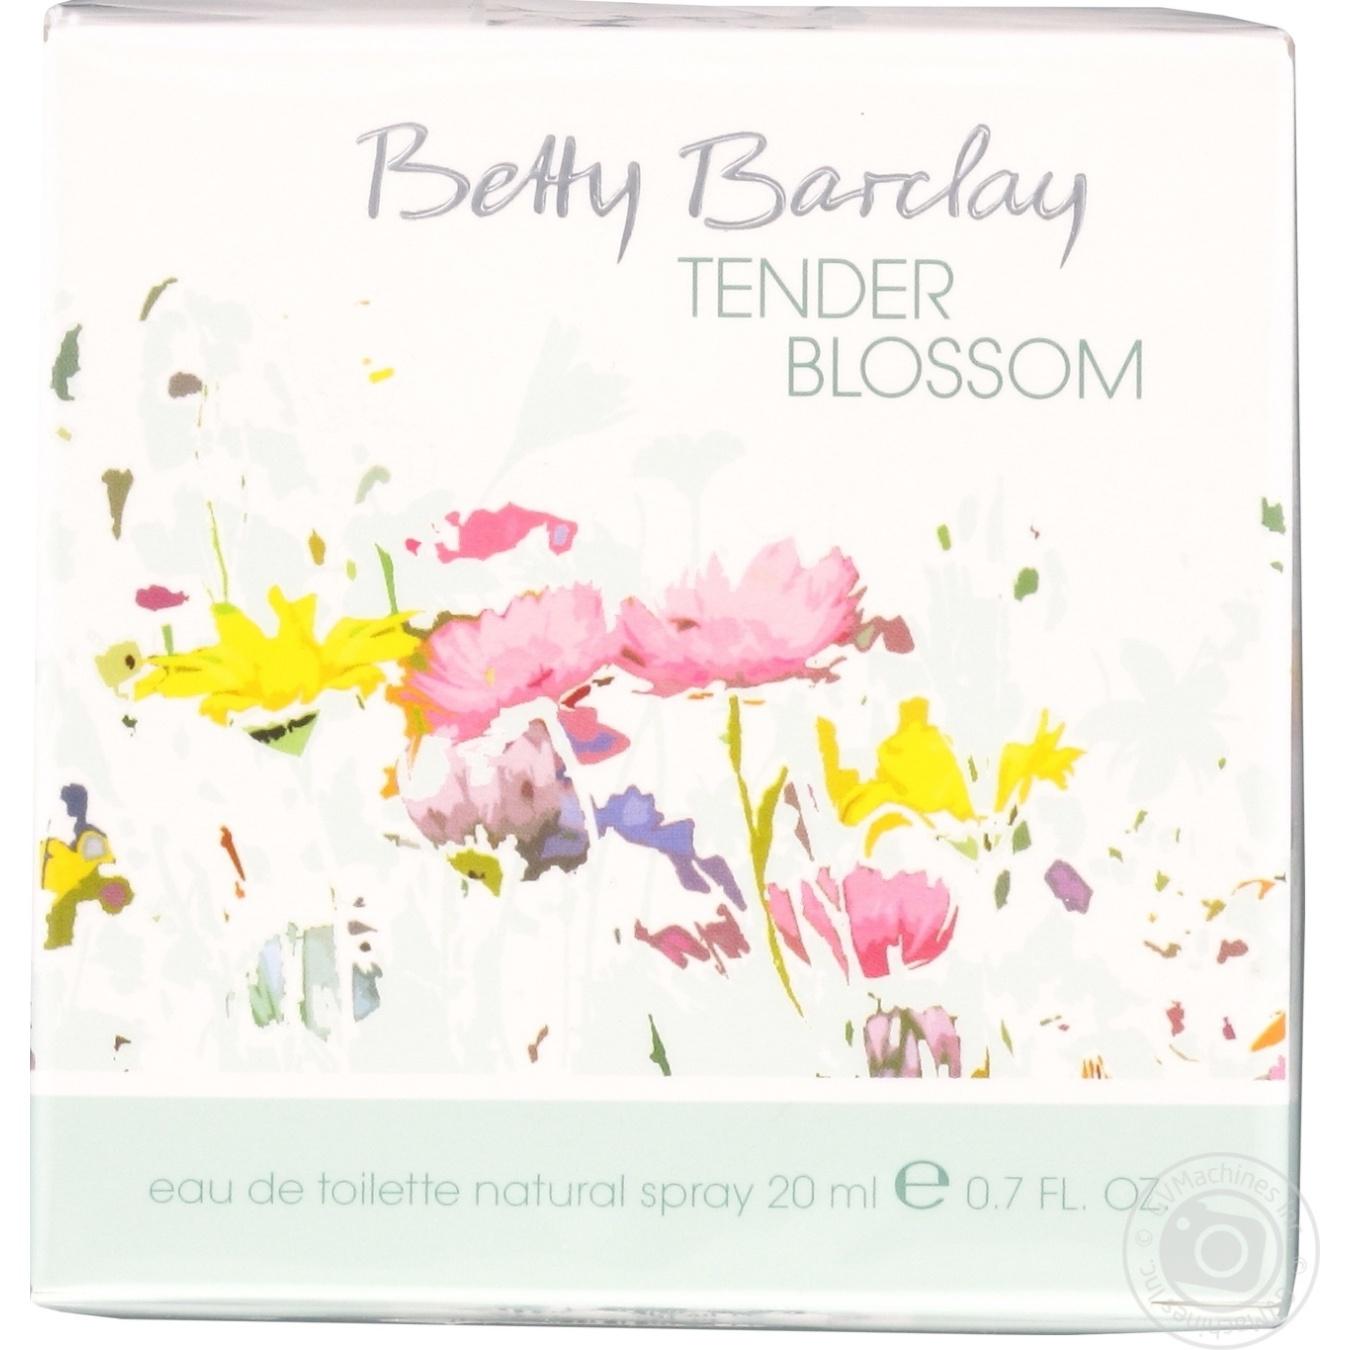 Eau de toilette Betty barclay for women → Hygiene → Cosmetics and perfumes  → Eau de toilette for women → Zakaz.ua - Official Online Grocery for ... 823fca02ed45c